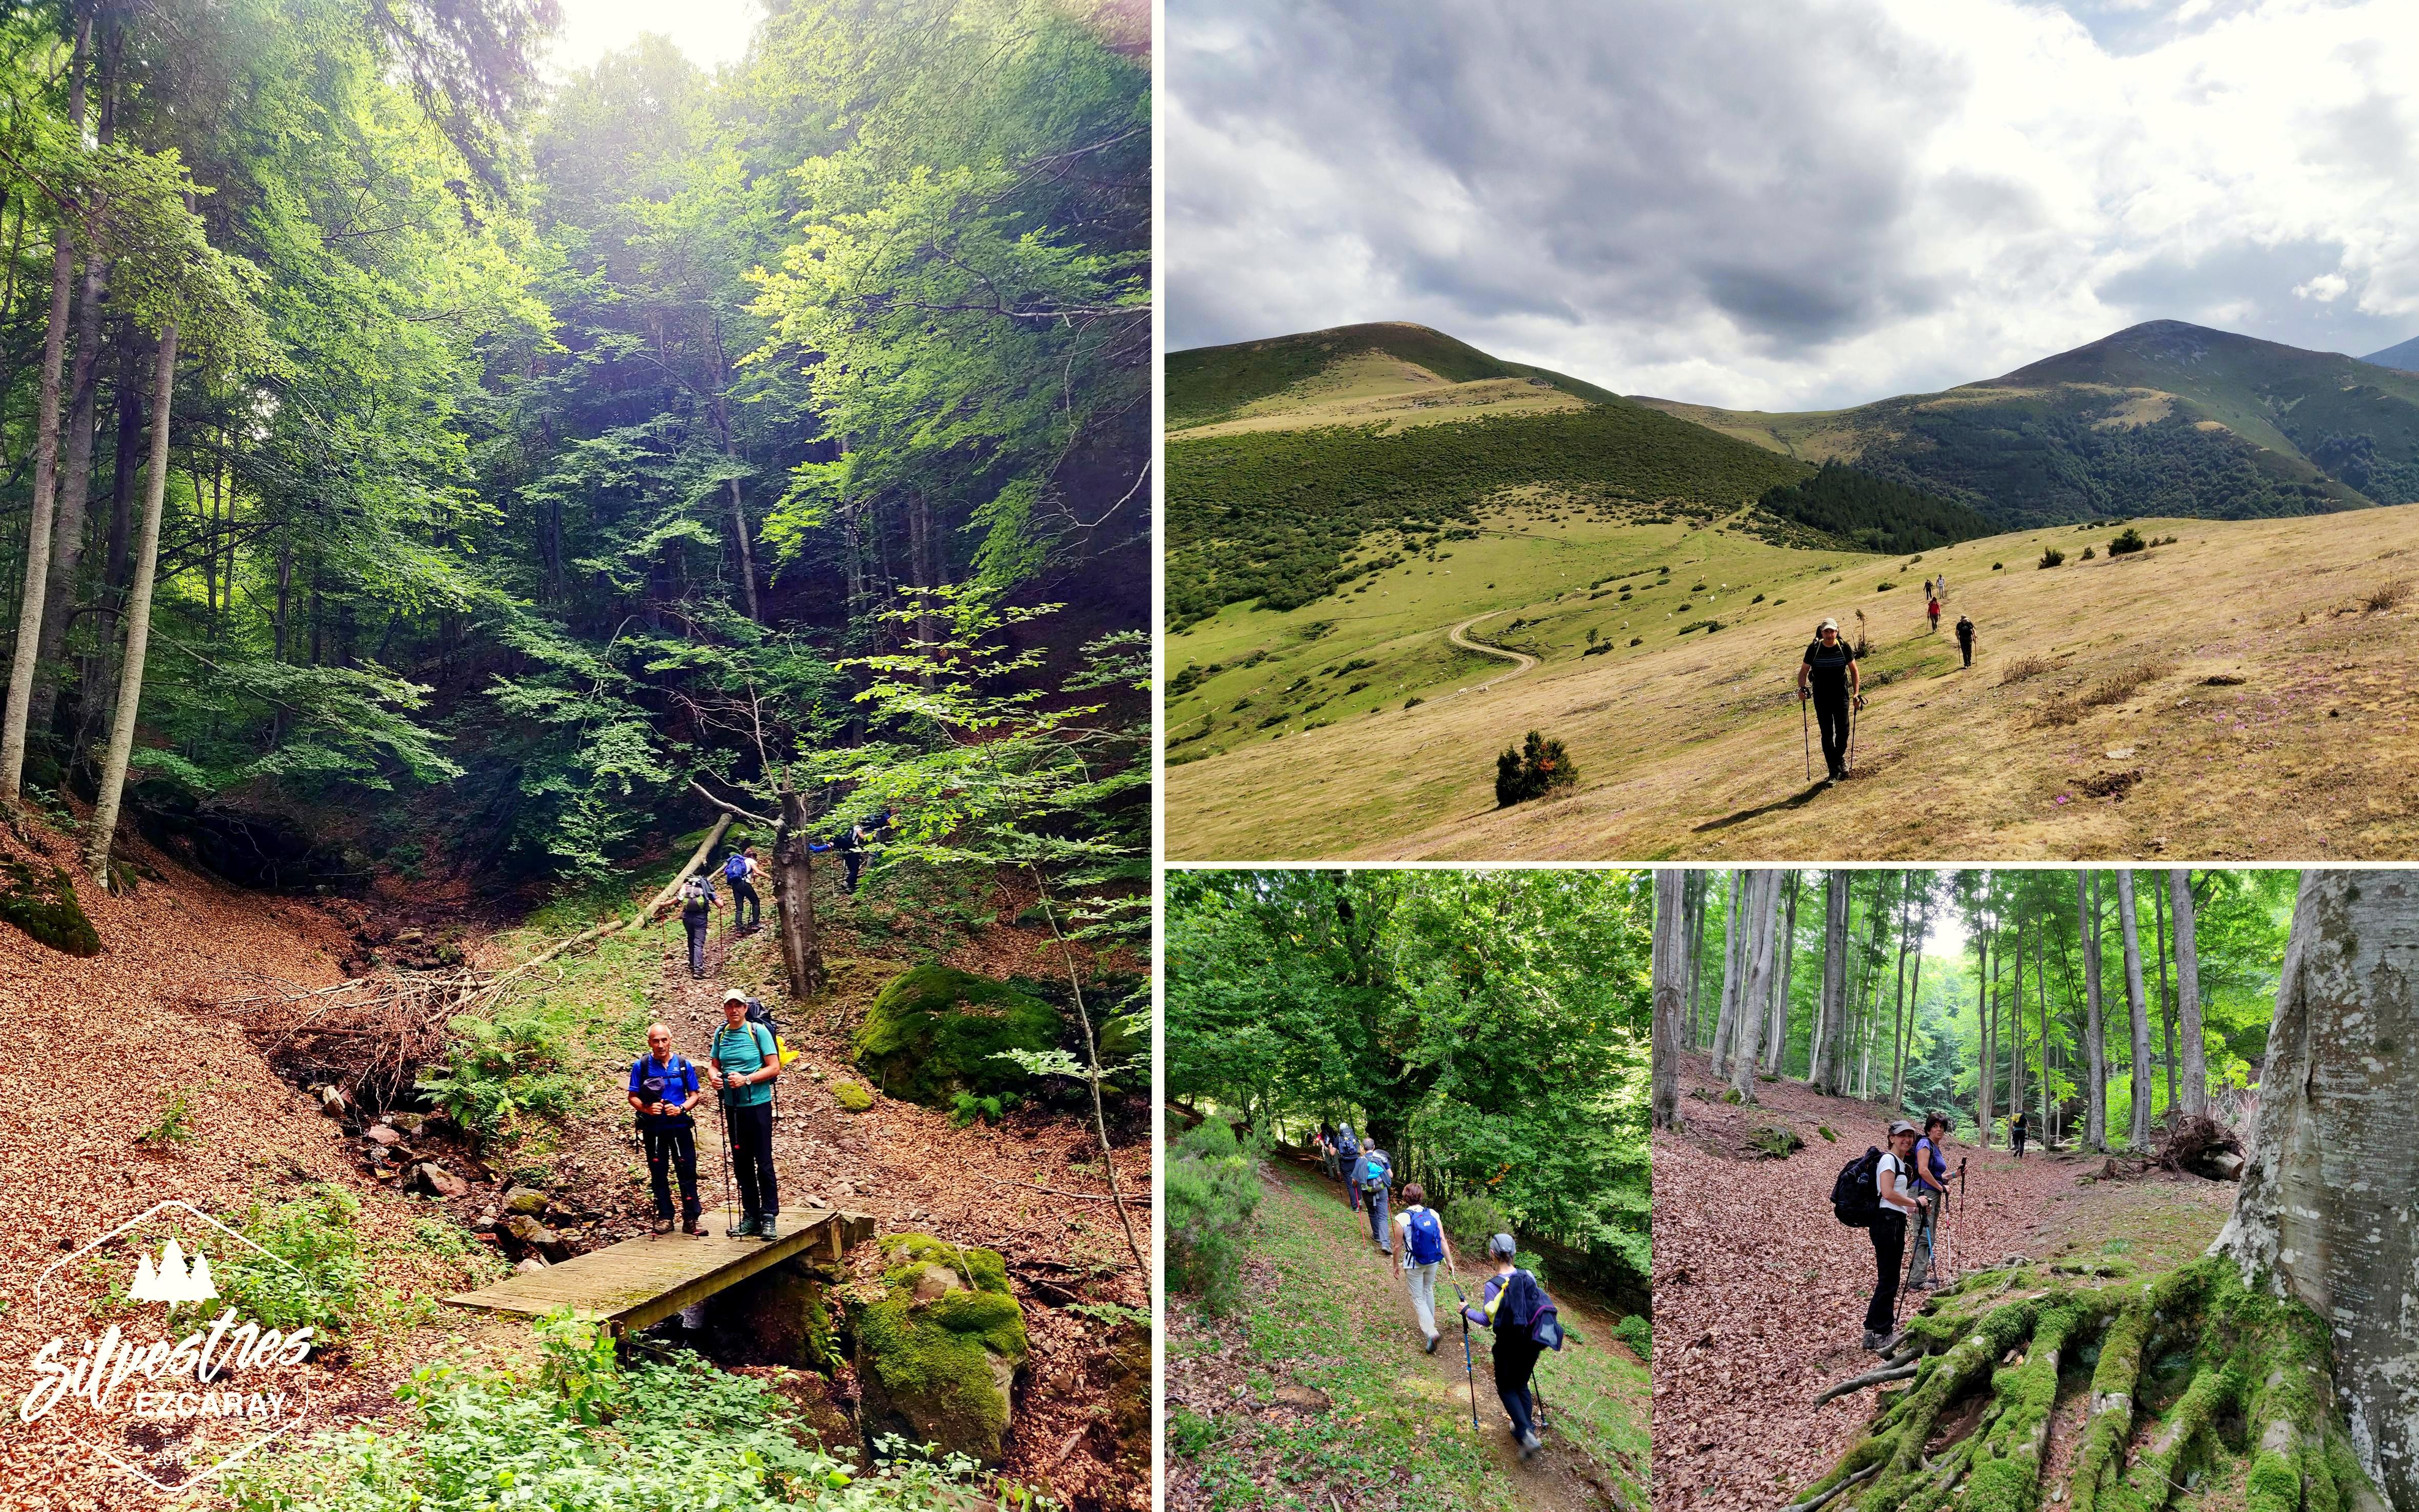 trekking_monasterios_la_rioja_san_millan_cogolla_valvanera_experiencias_guia_montaña_empresa